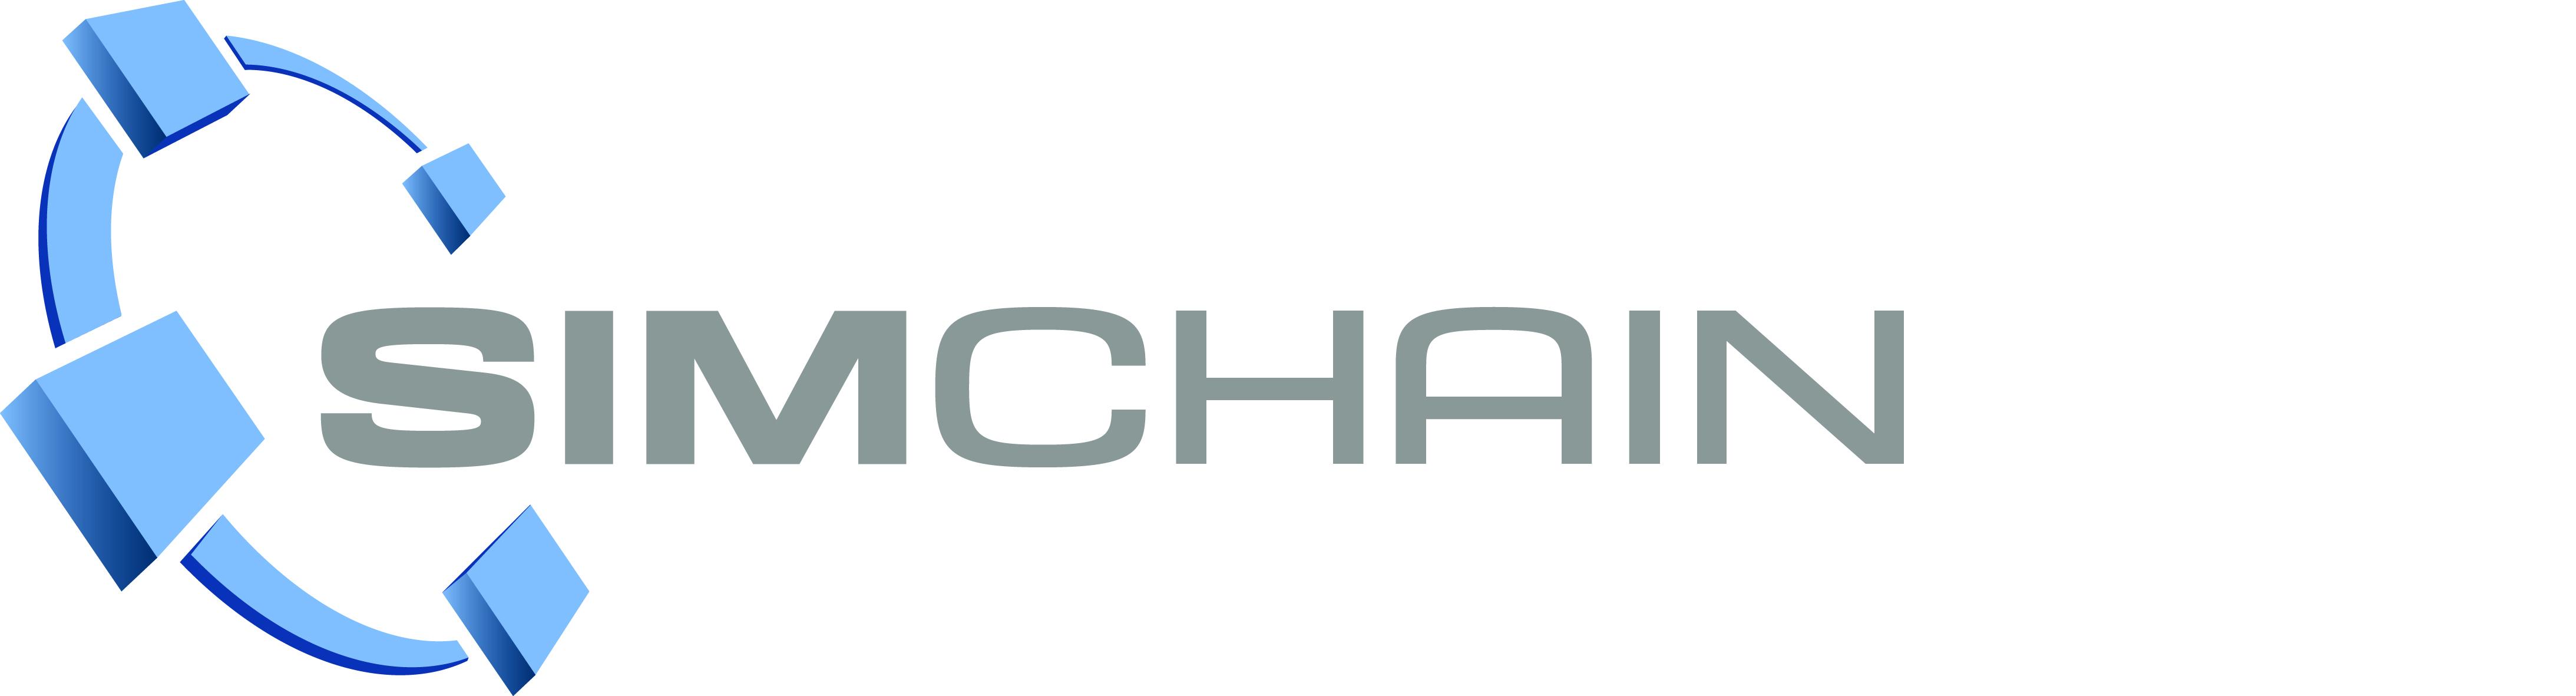 SimChain Logo